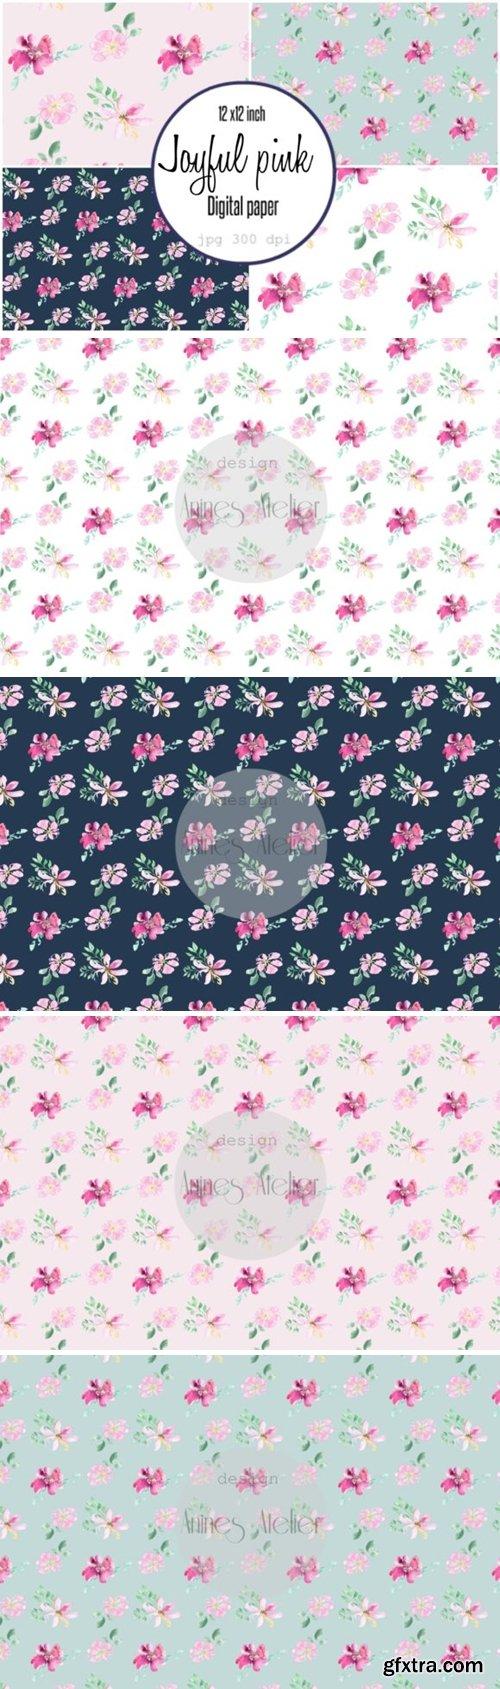 Digital Paper Loose Watercolor Flowers